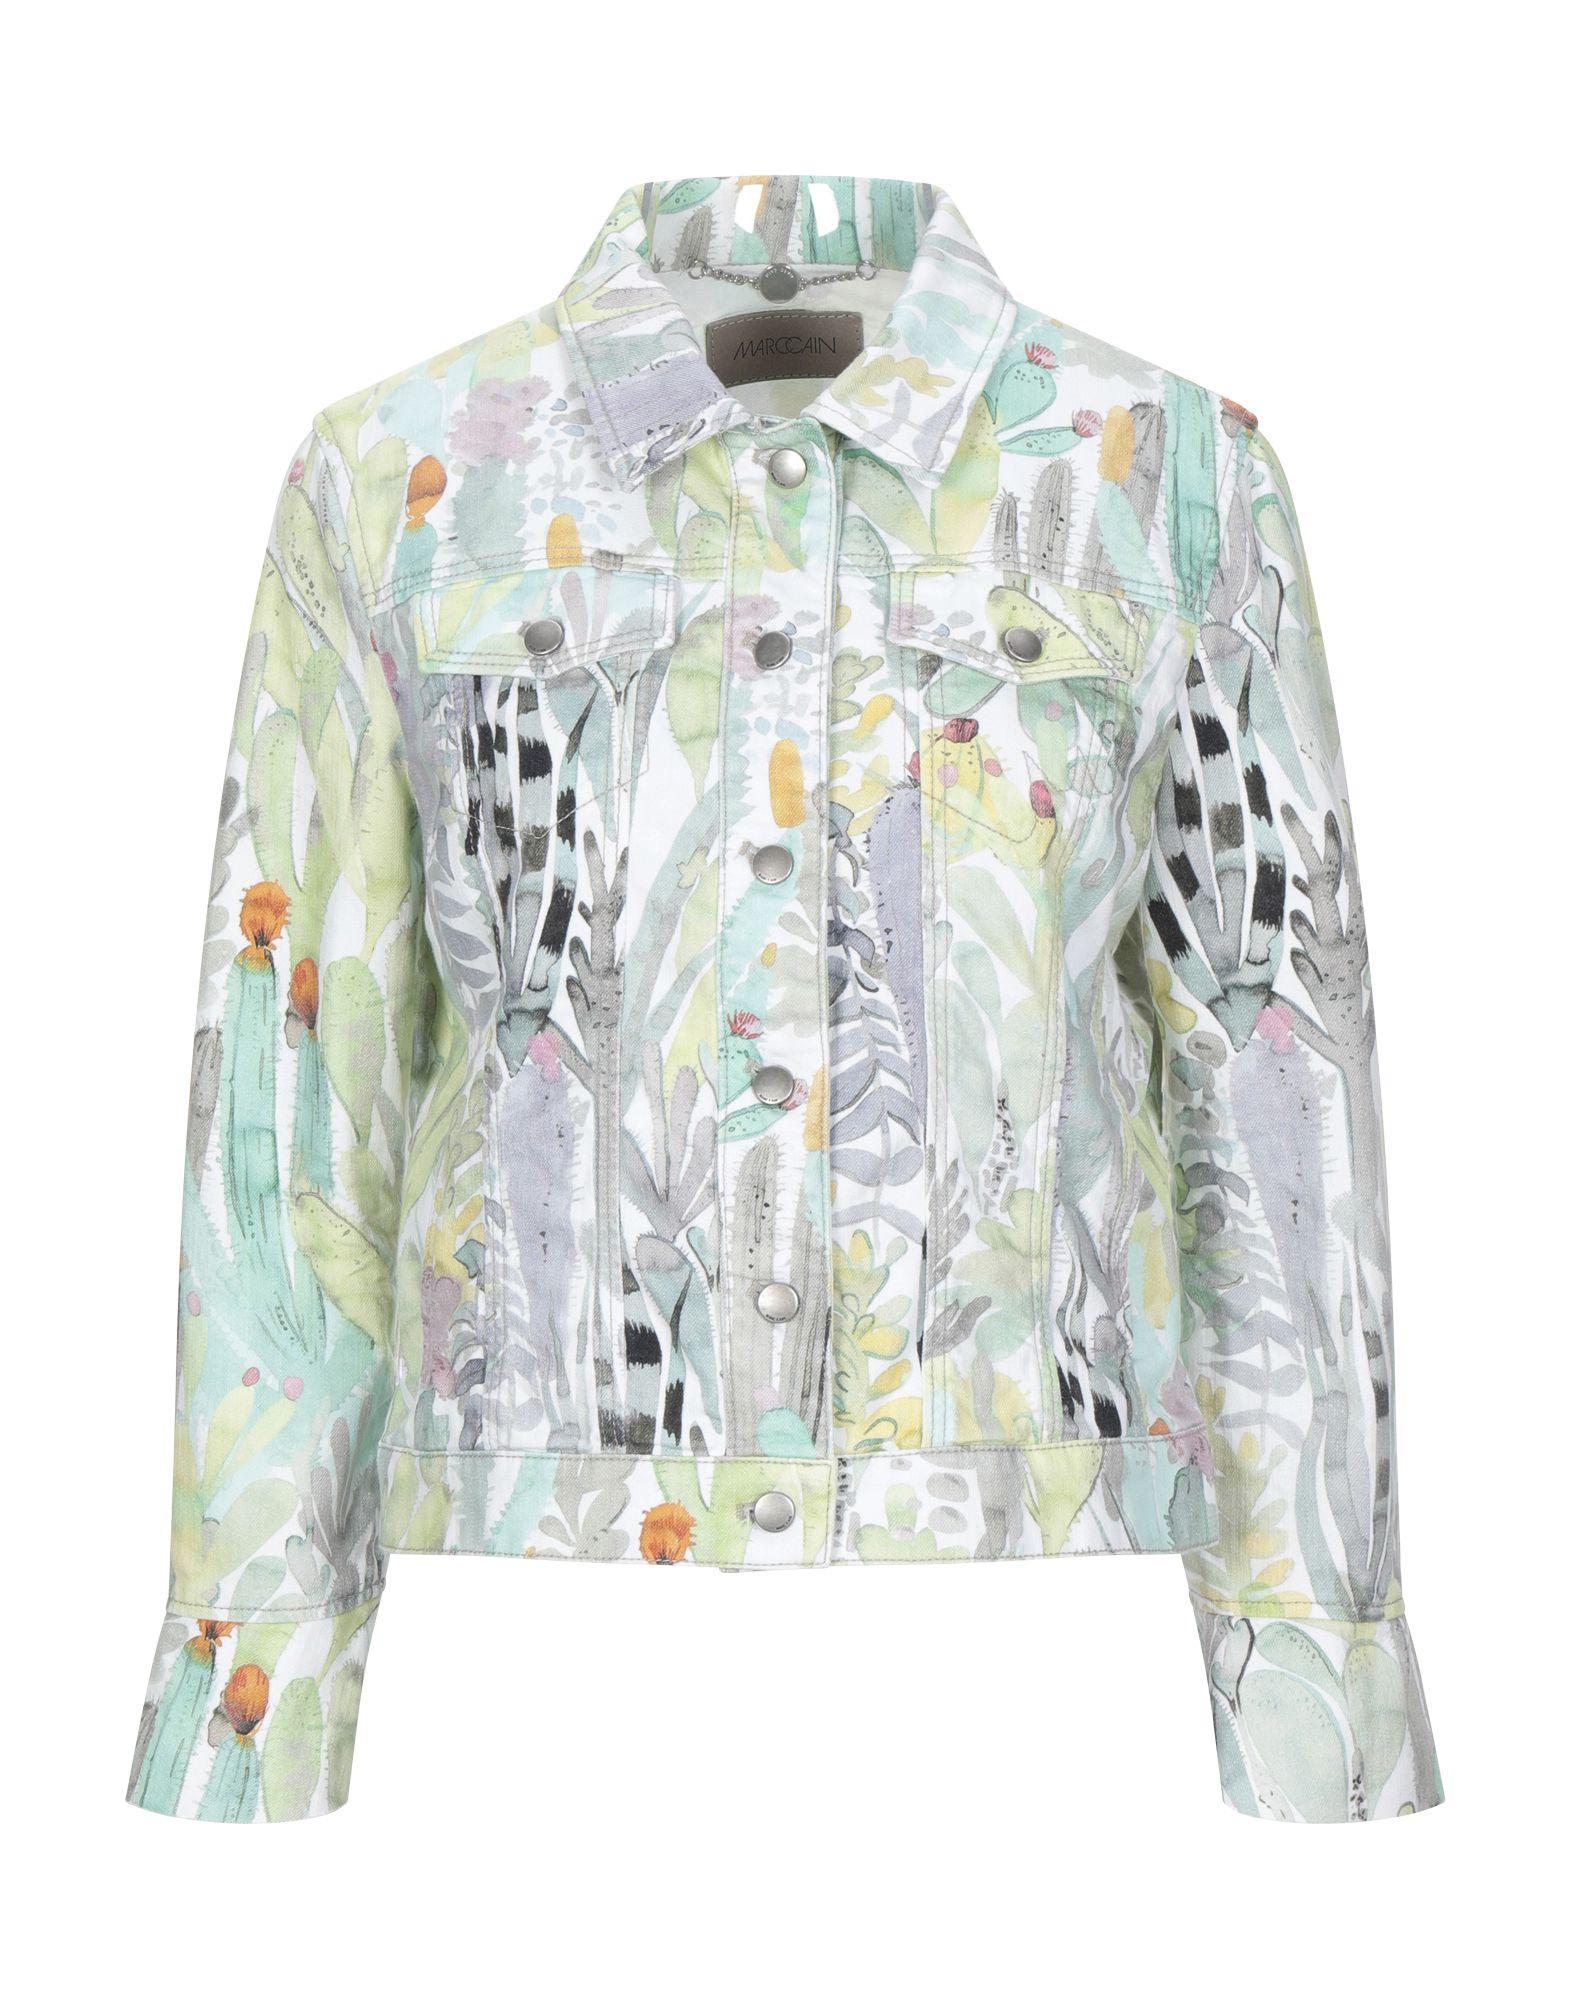 MARC CAIN Джинсовая рубашка marc cain платье marc cain 211518 серый page 2 page 4